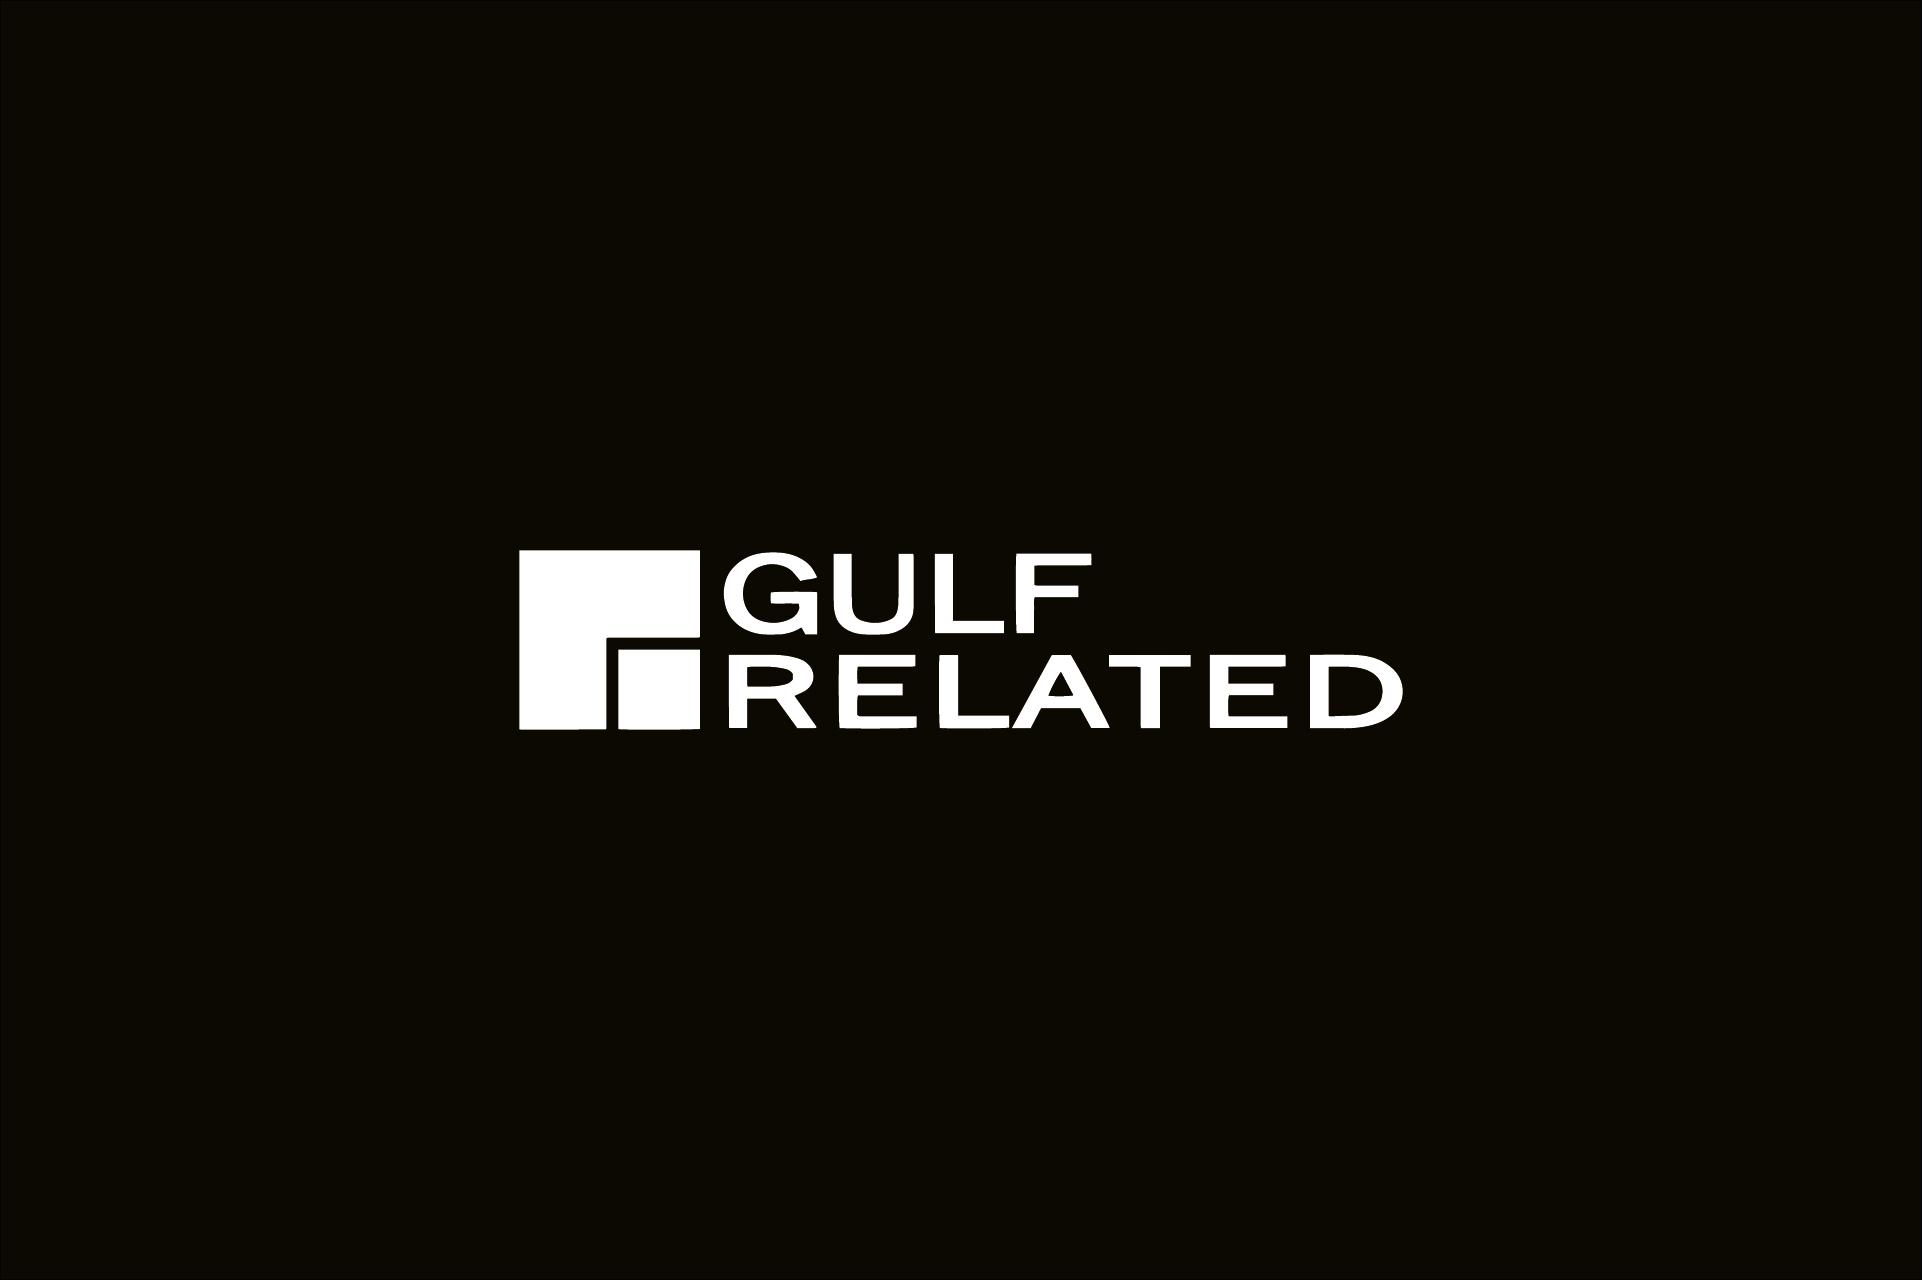 Gulf Related